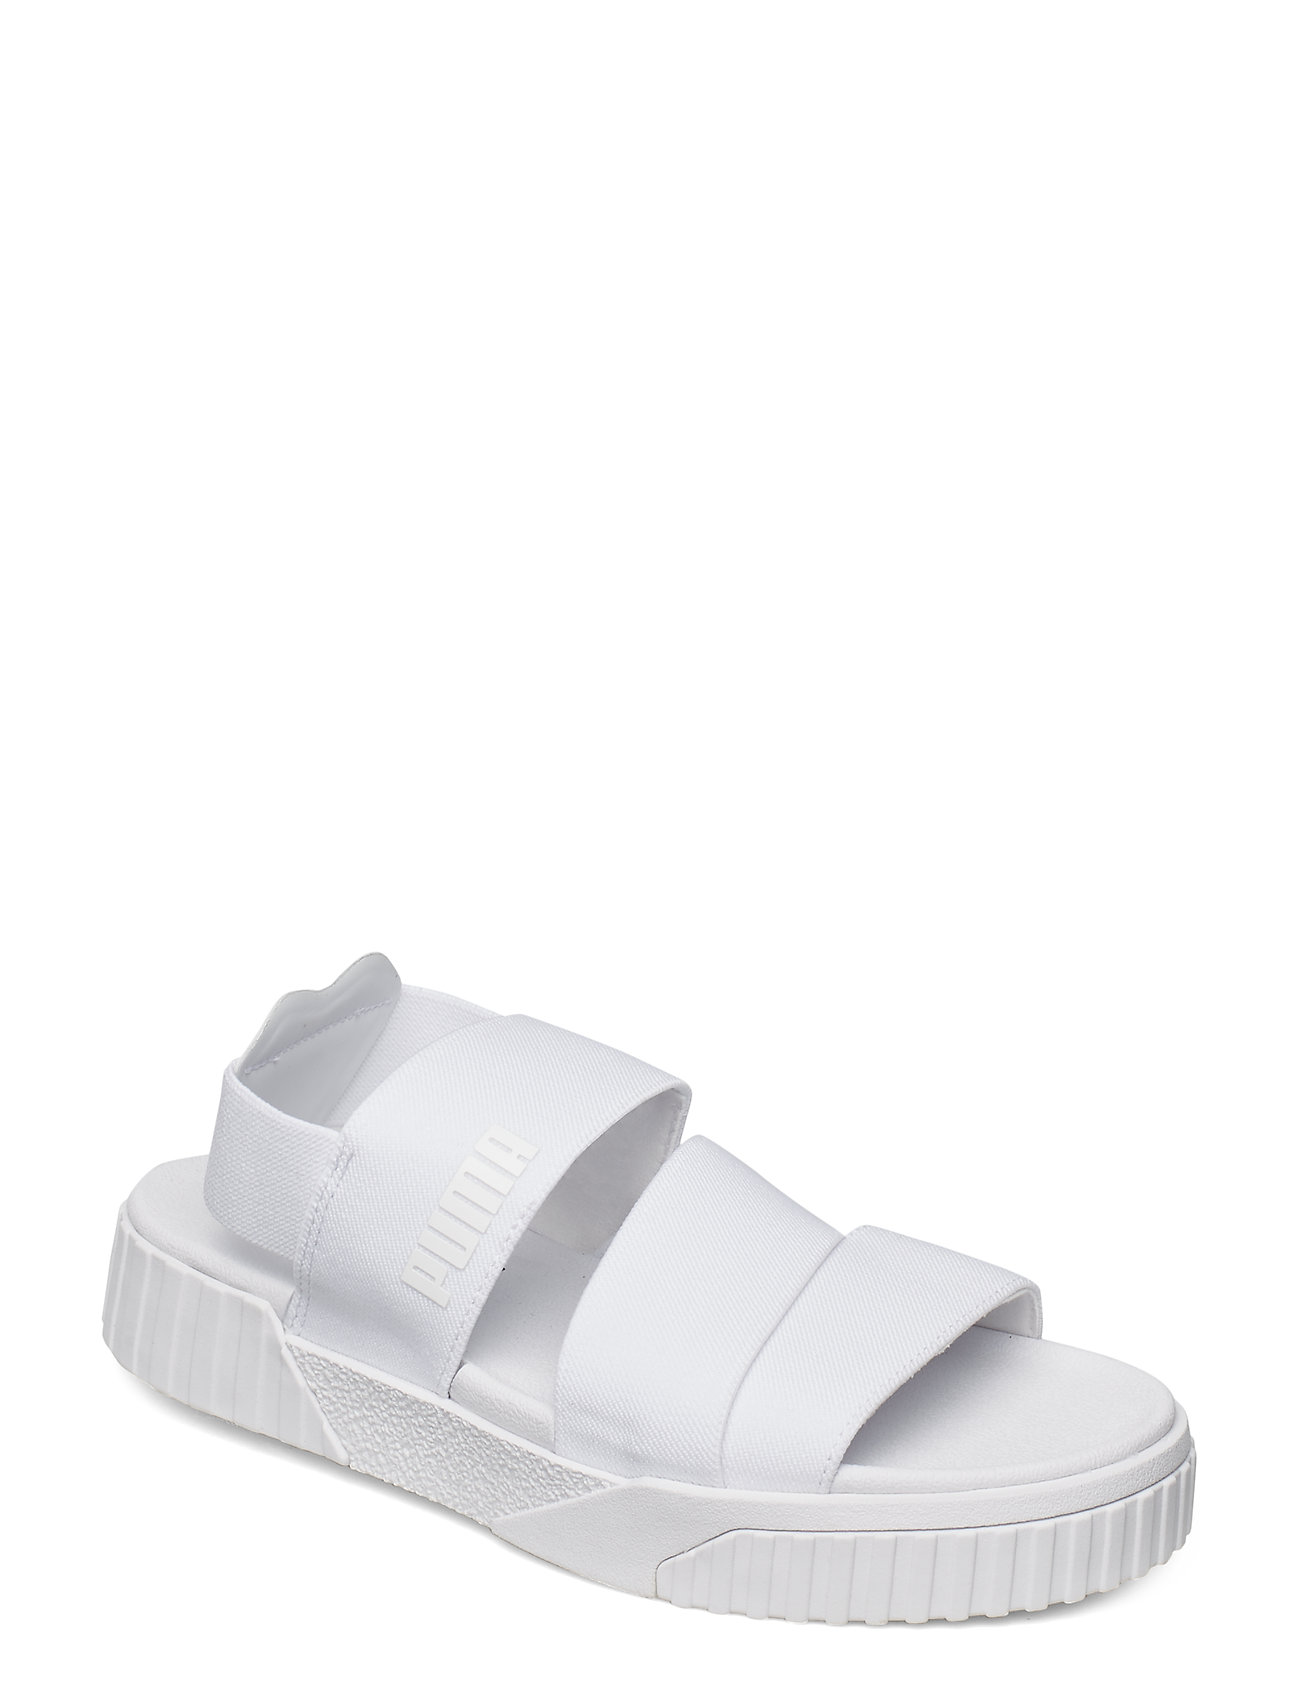 PUMA Cali Sandal X Sg (Puma White), (37